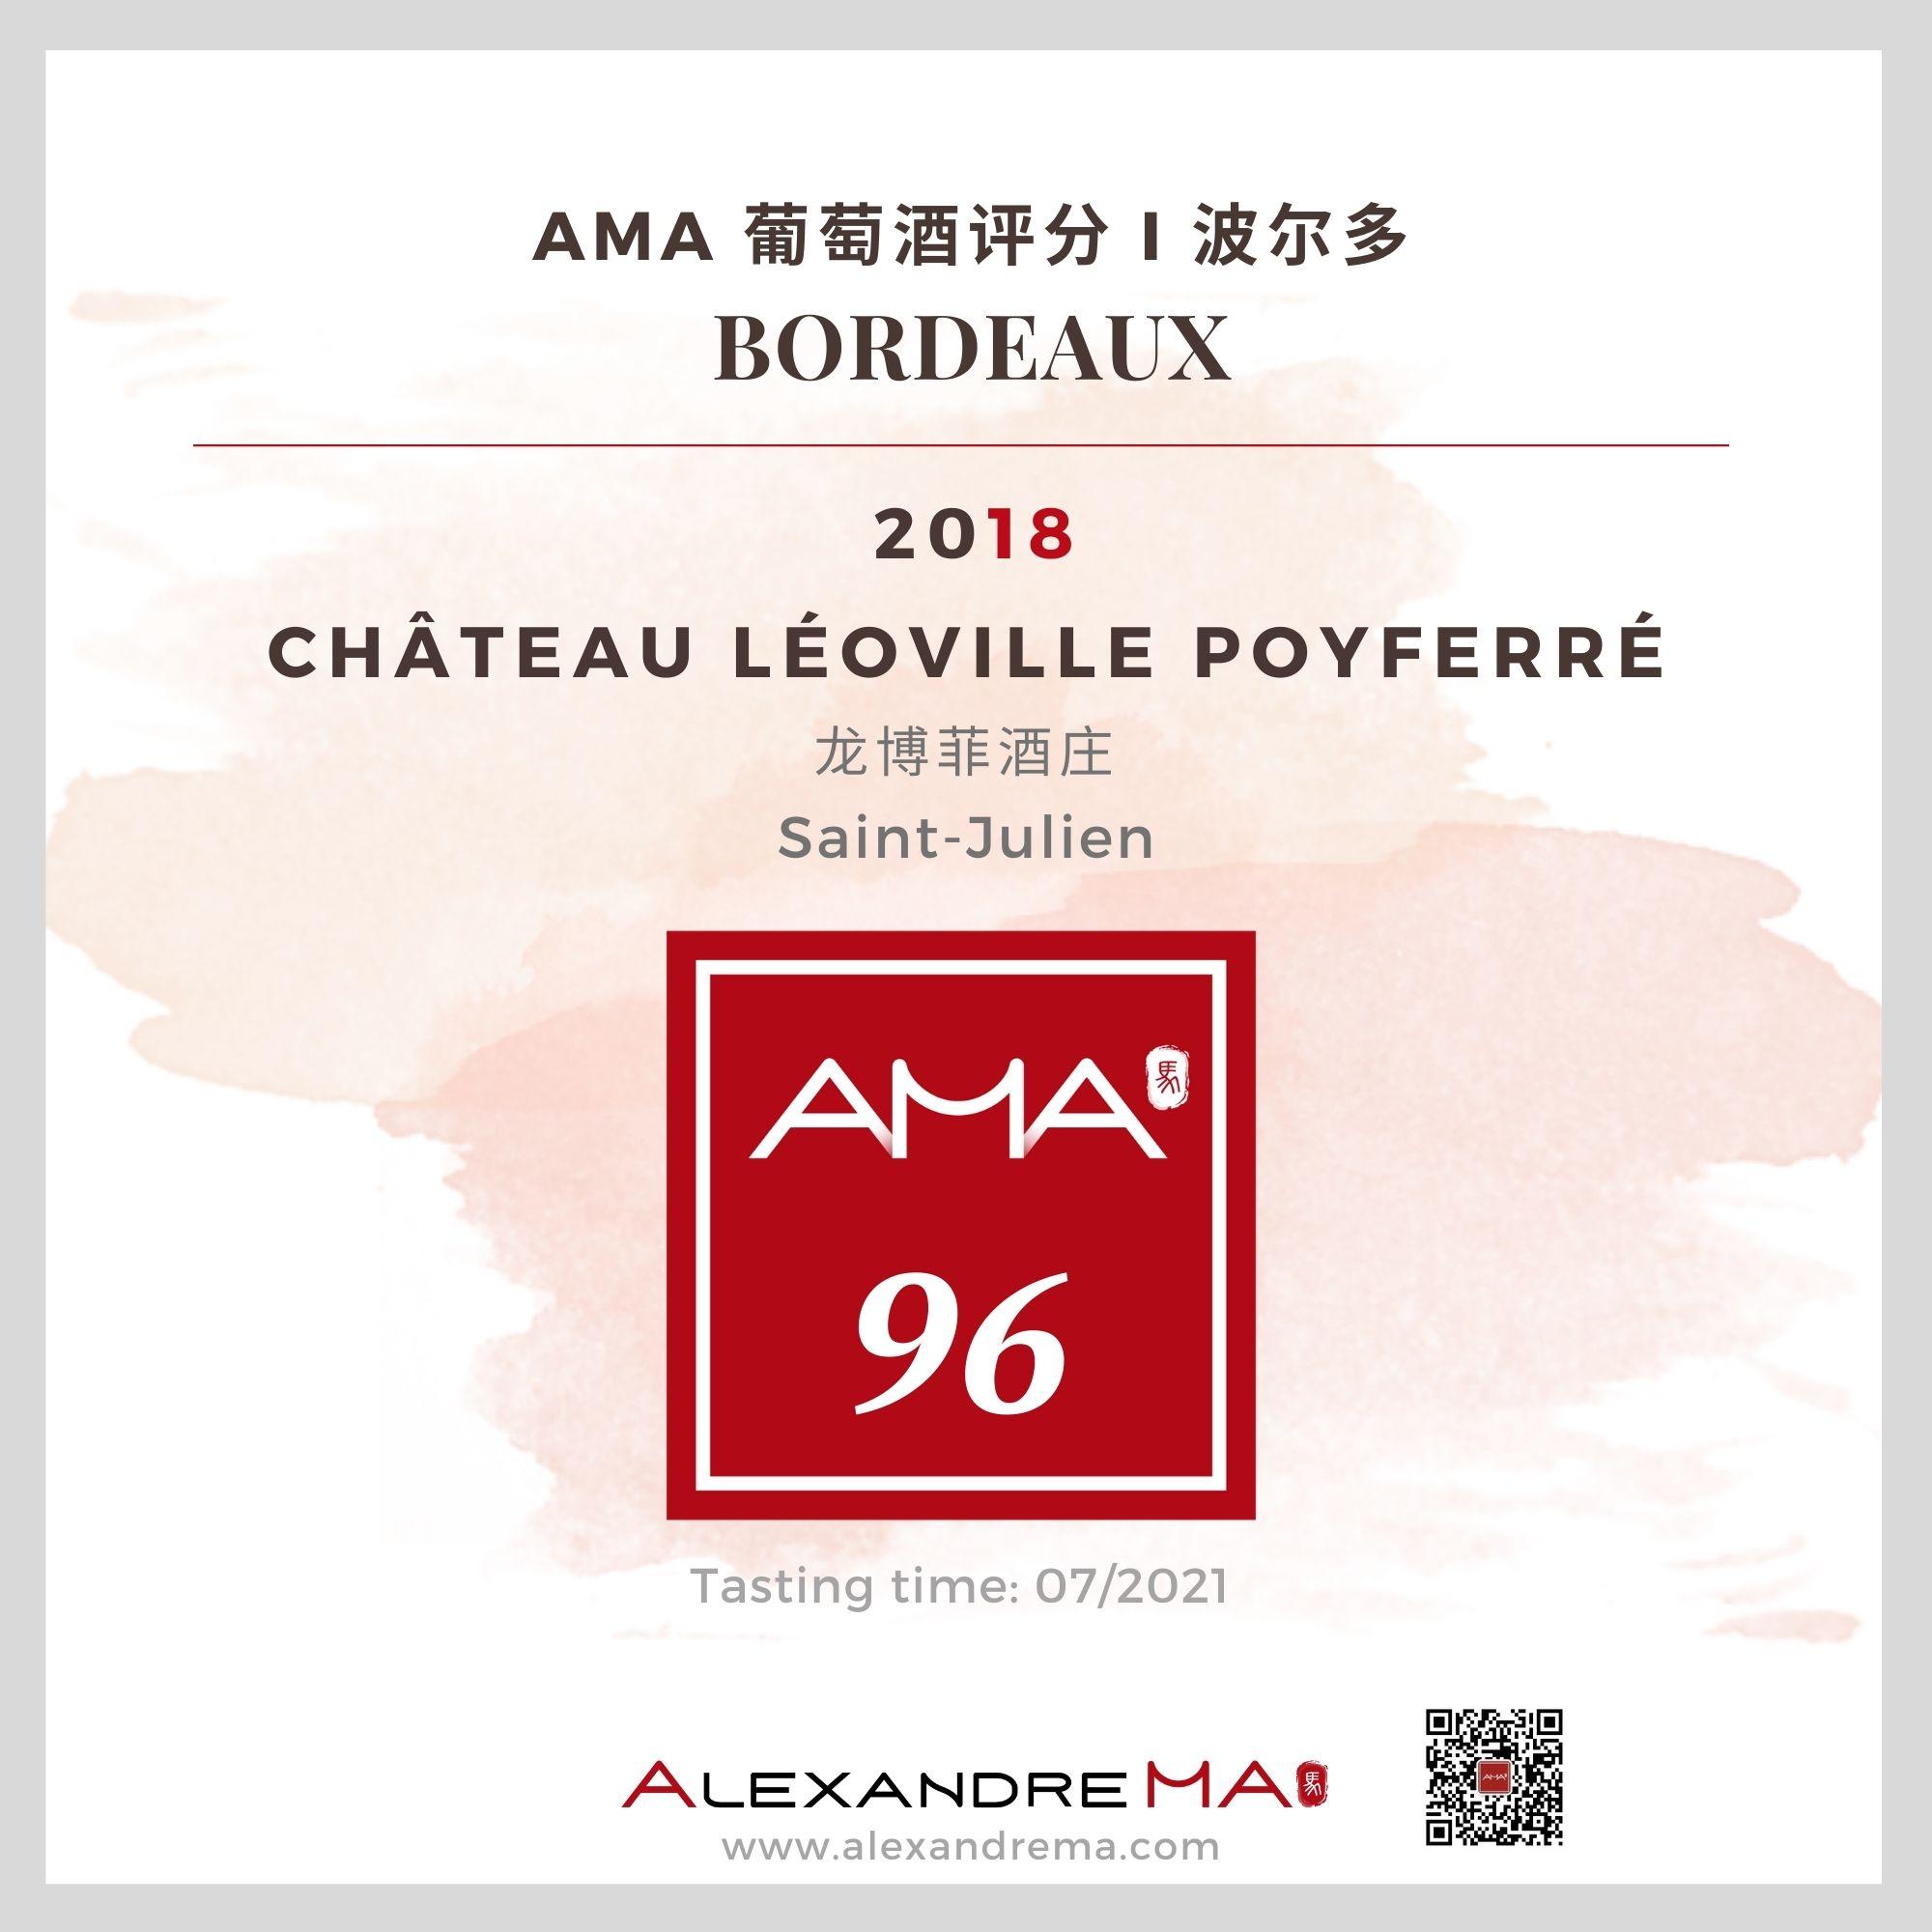 Château Léoville Poyferré 2018 - Alexandre MA